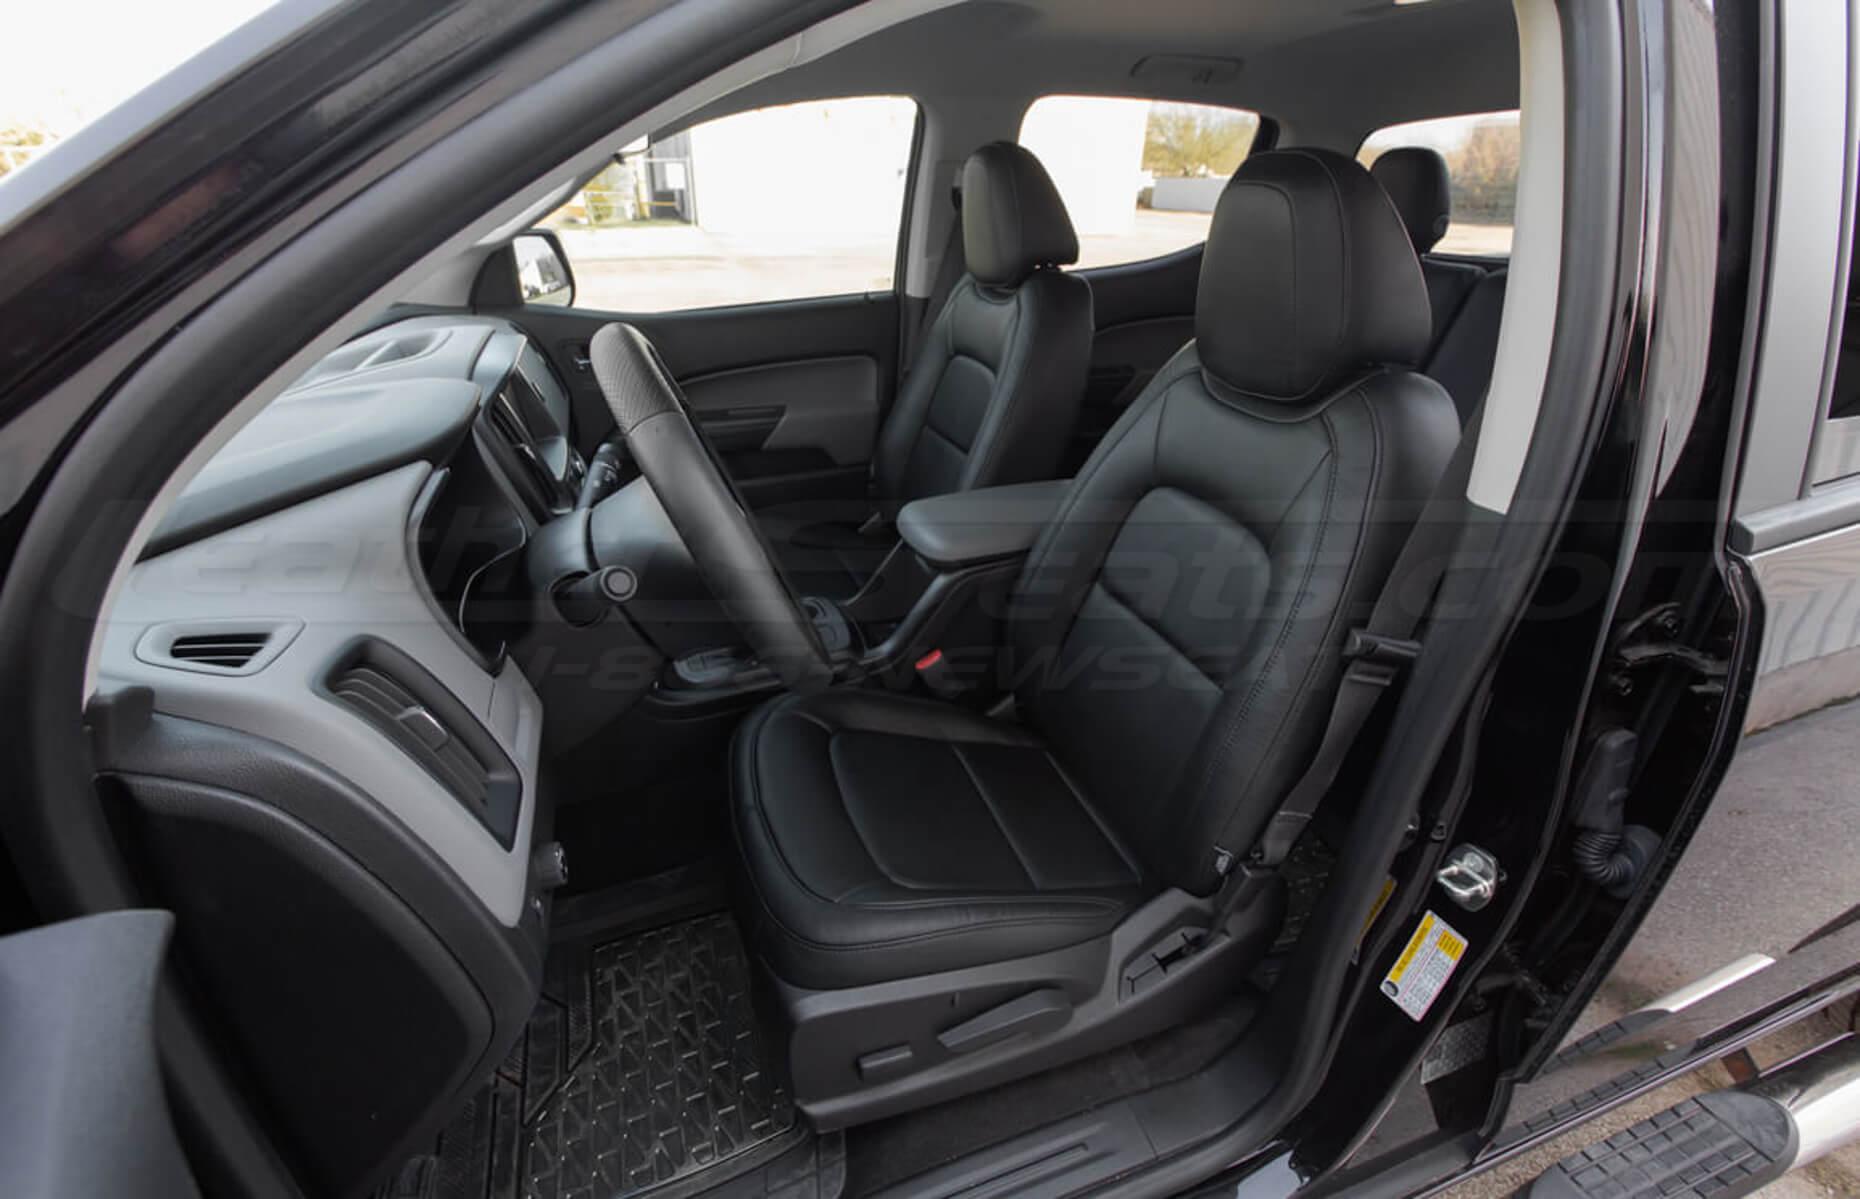 Chevrolet Colorado Leather Seats - Black - Front Driver